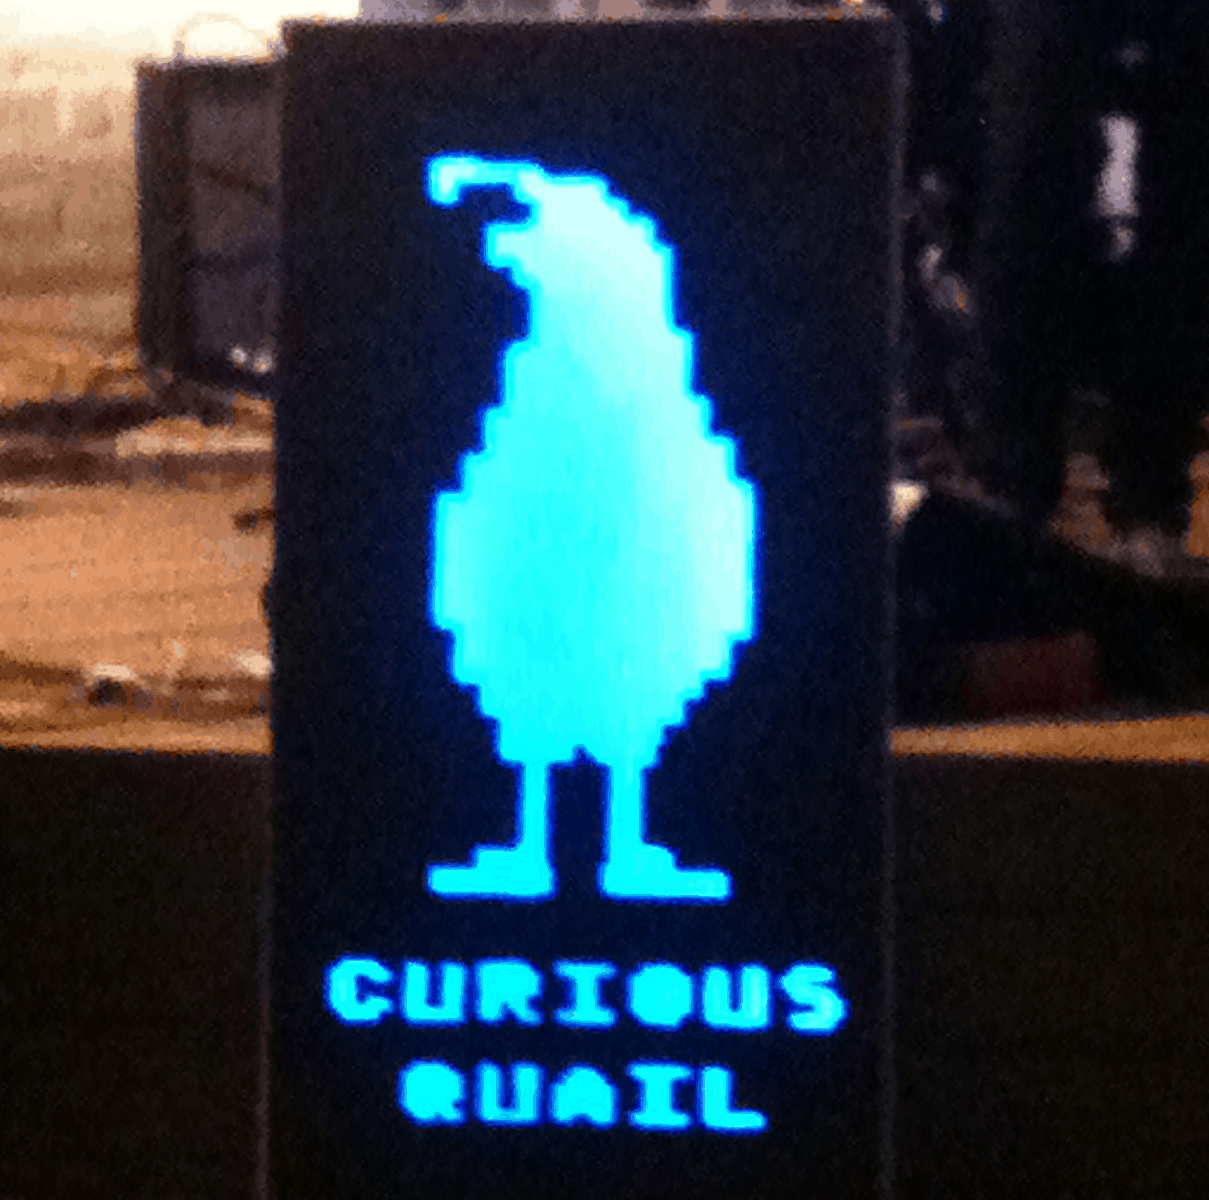 Curious Quail Stolen Violin Fundraiser